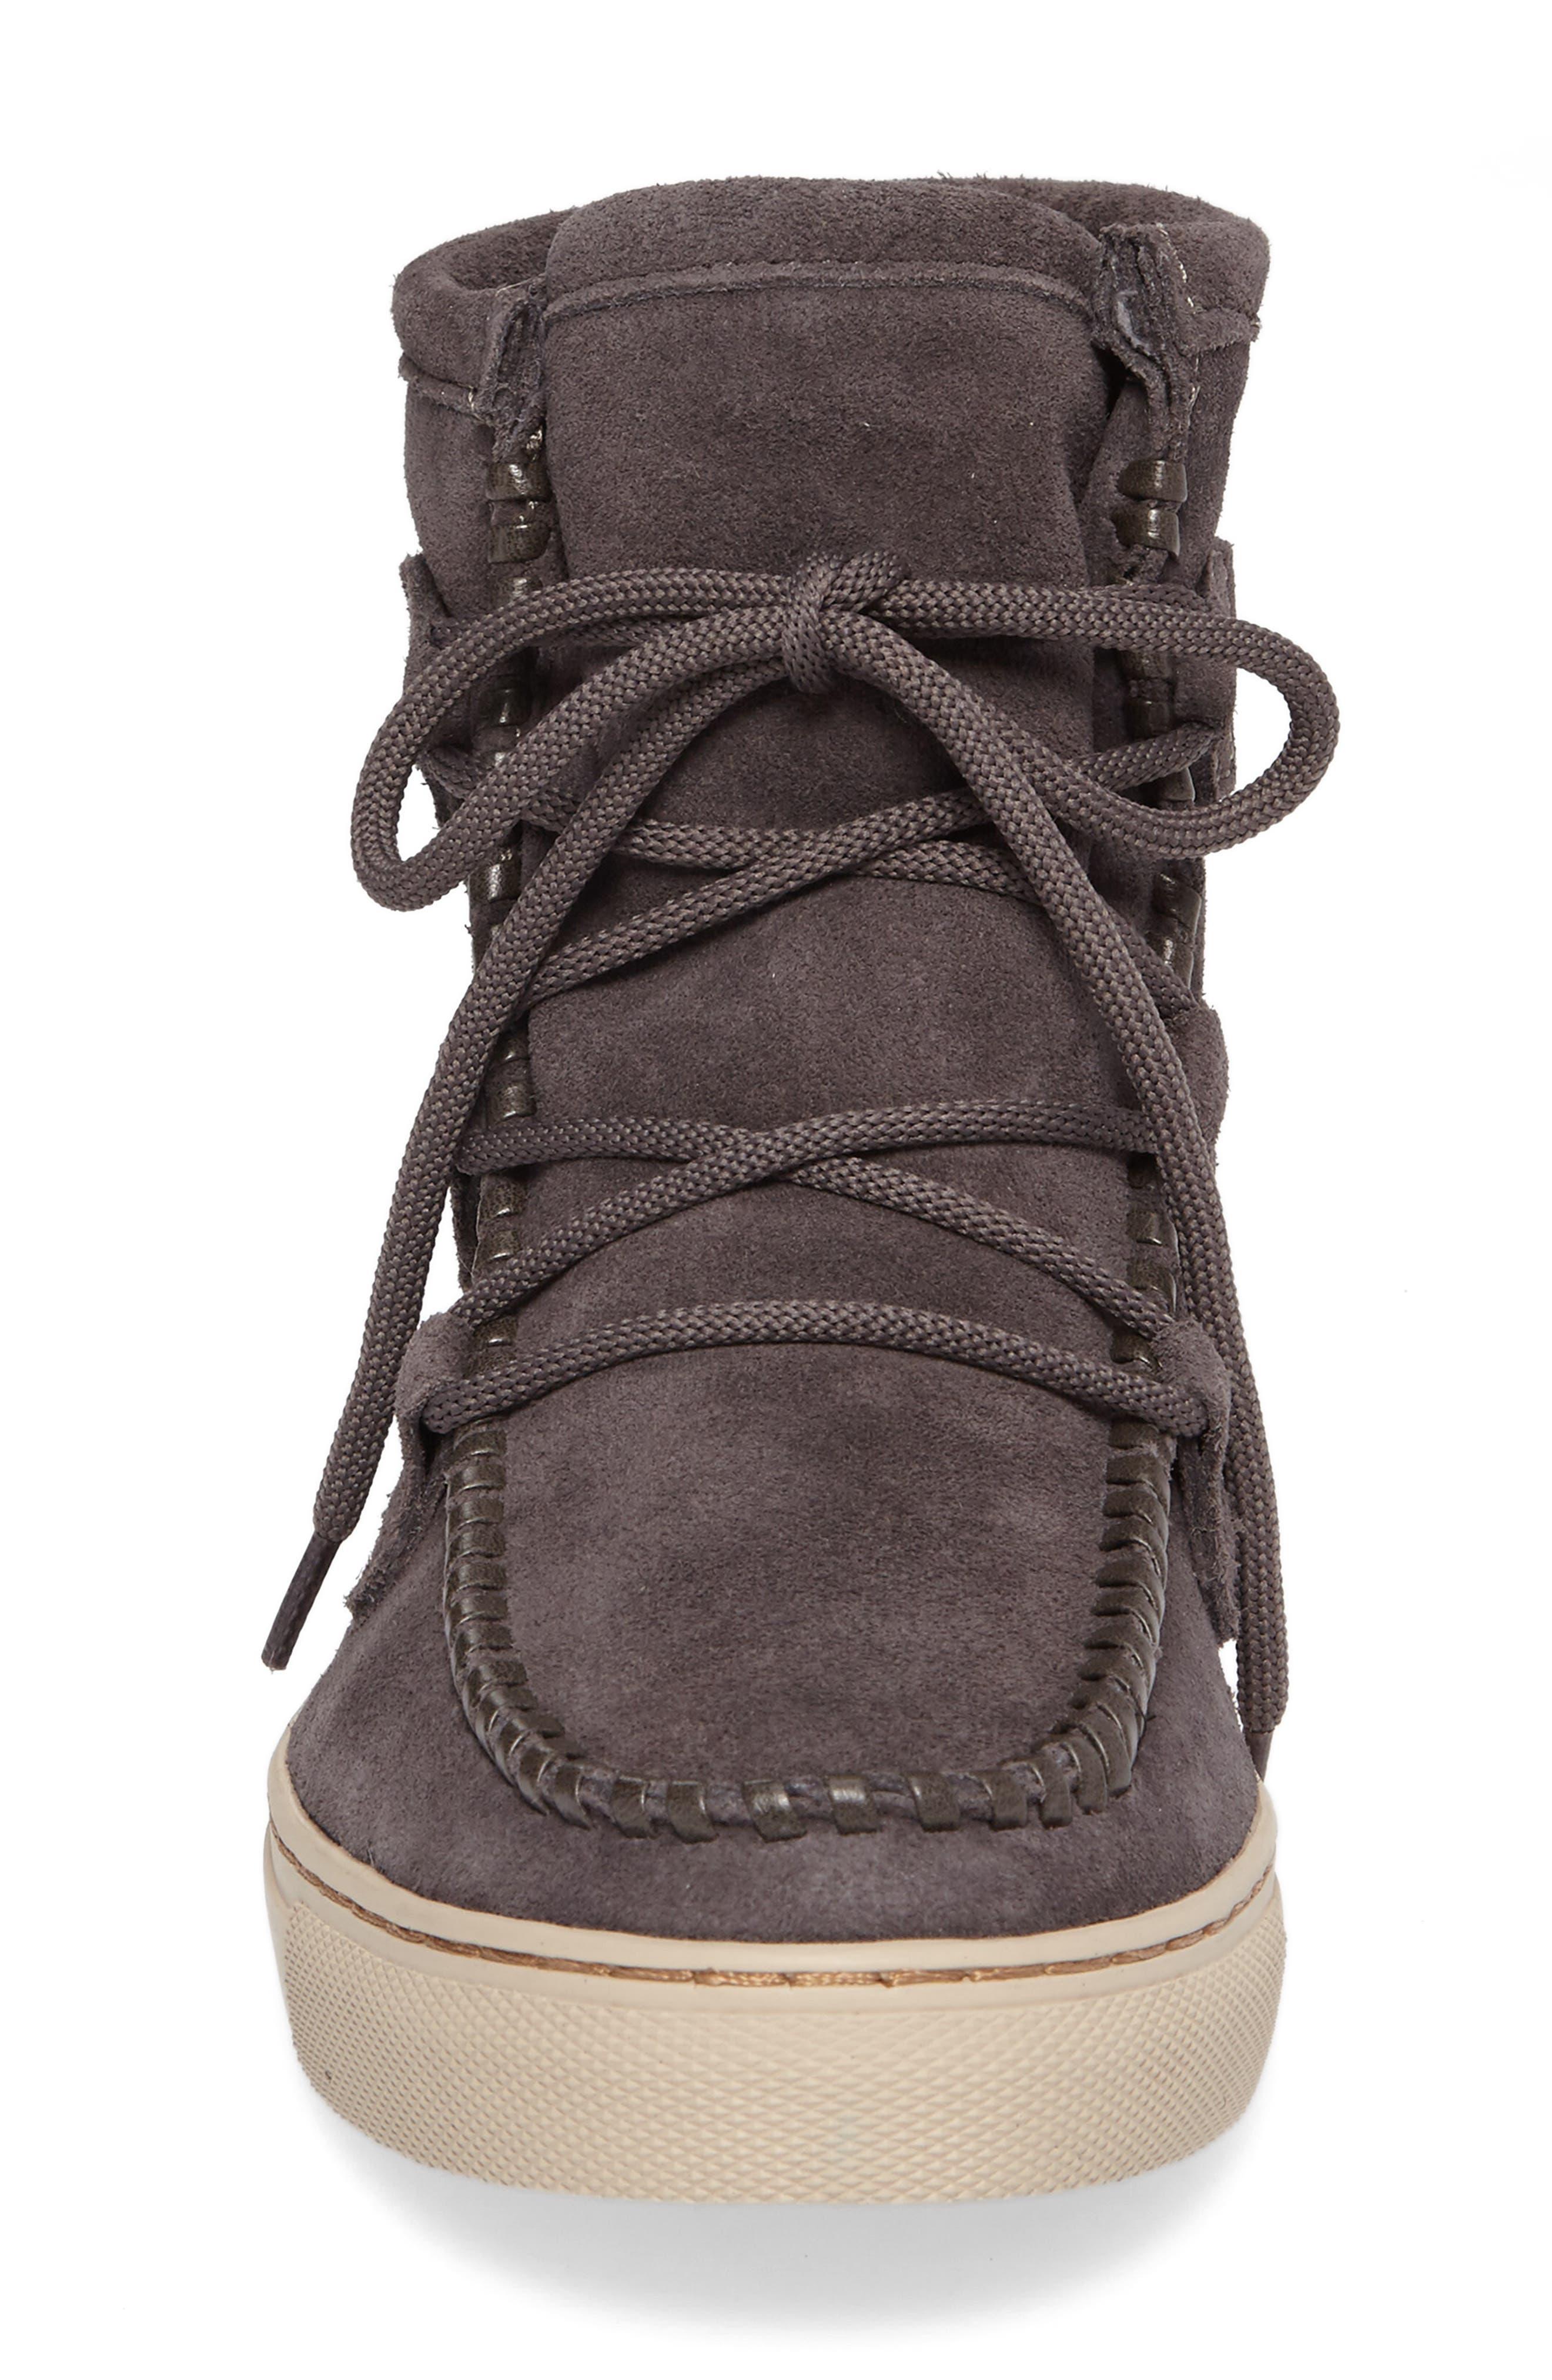 Alternate Image 4  - Cougar Fabiola Waterproof High Top Sneaker (Women)